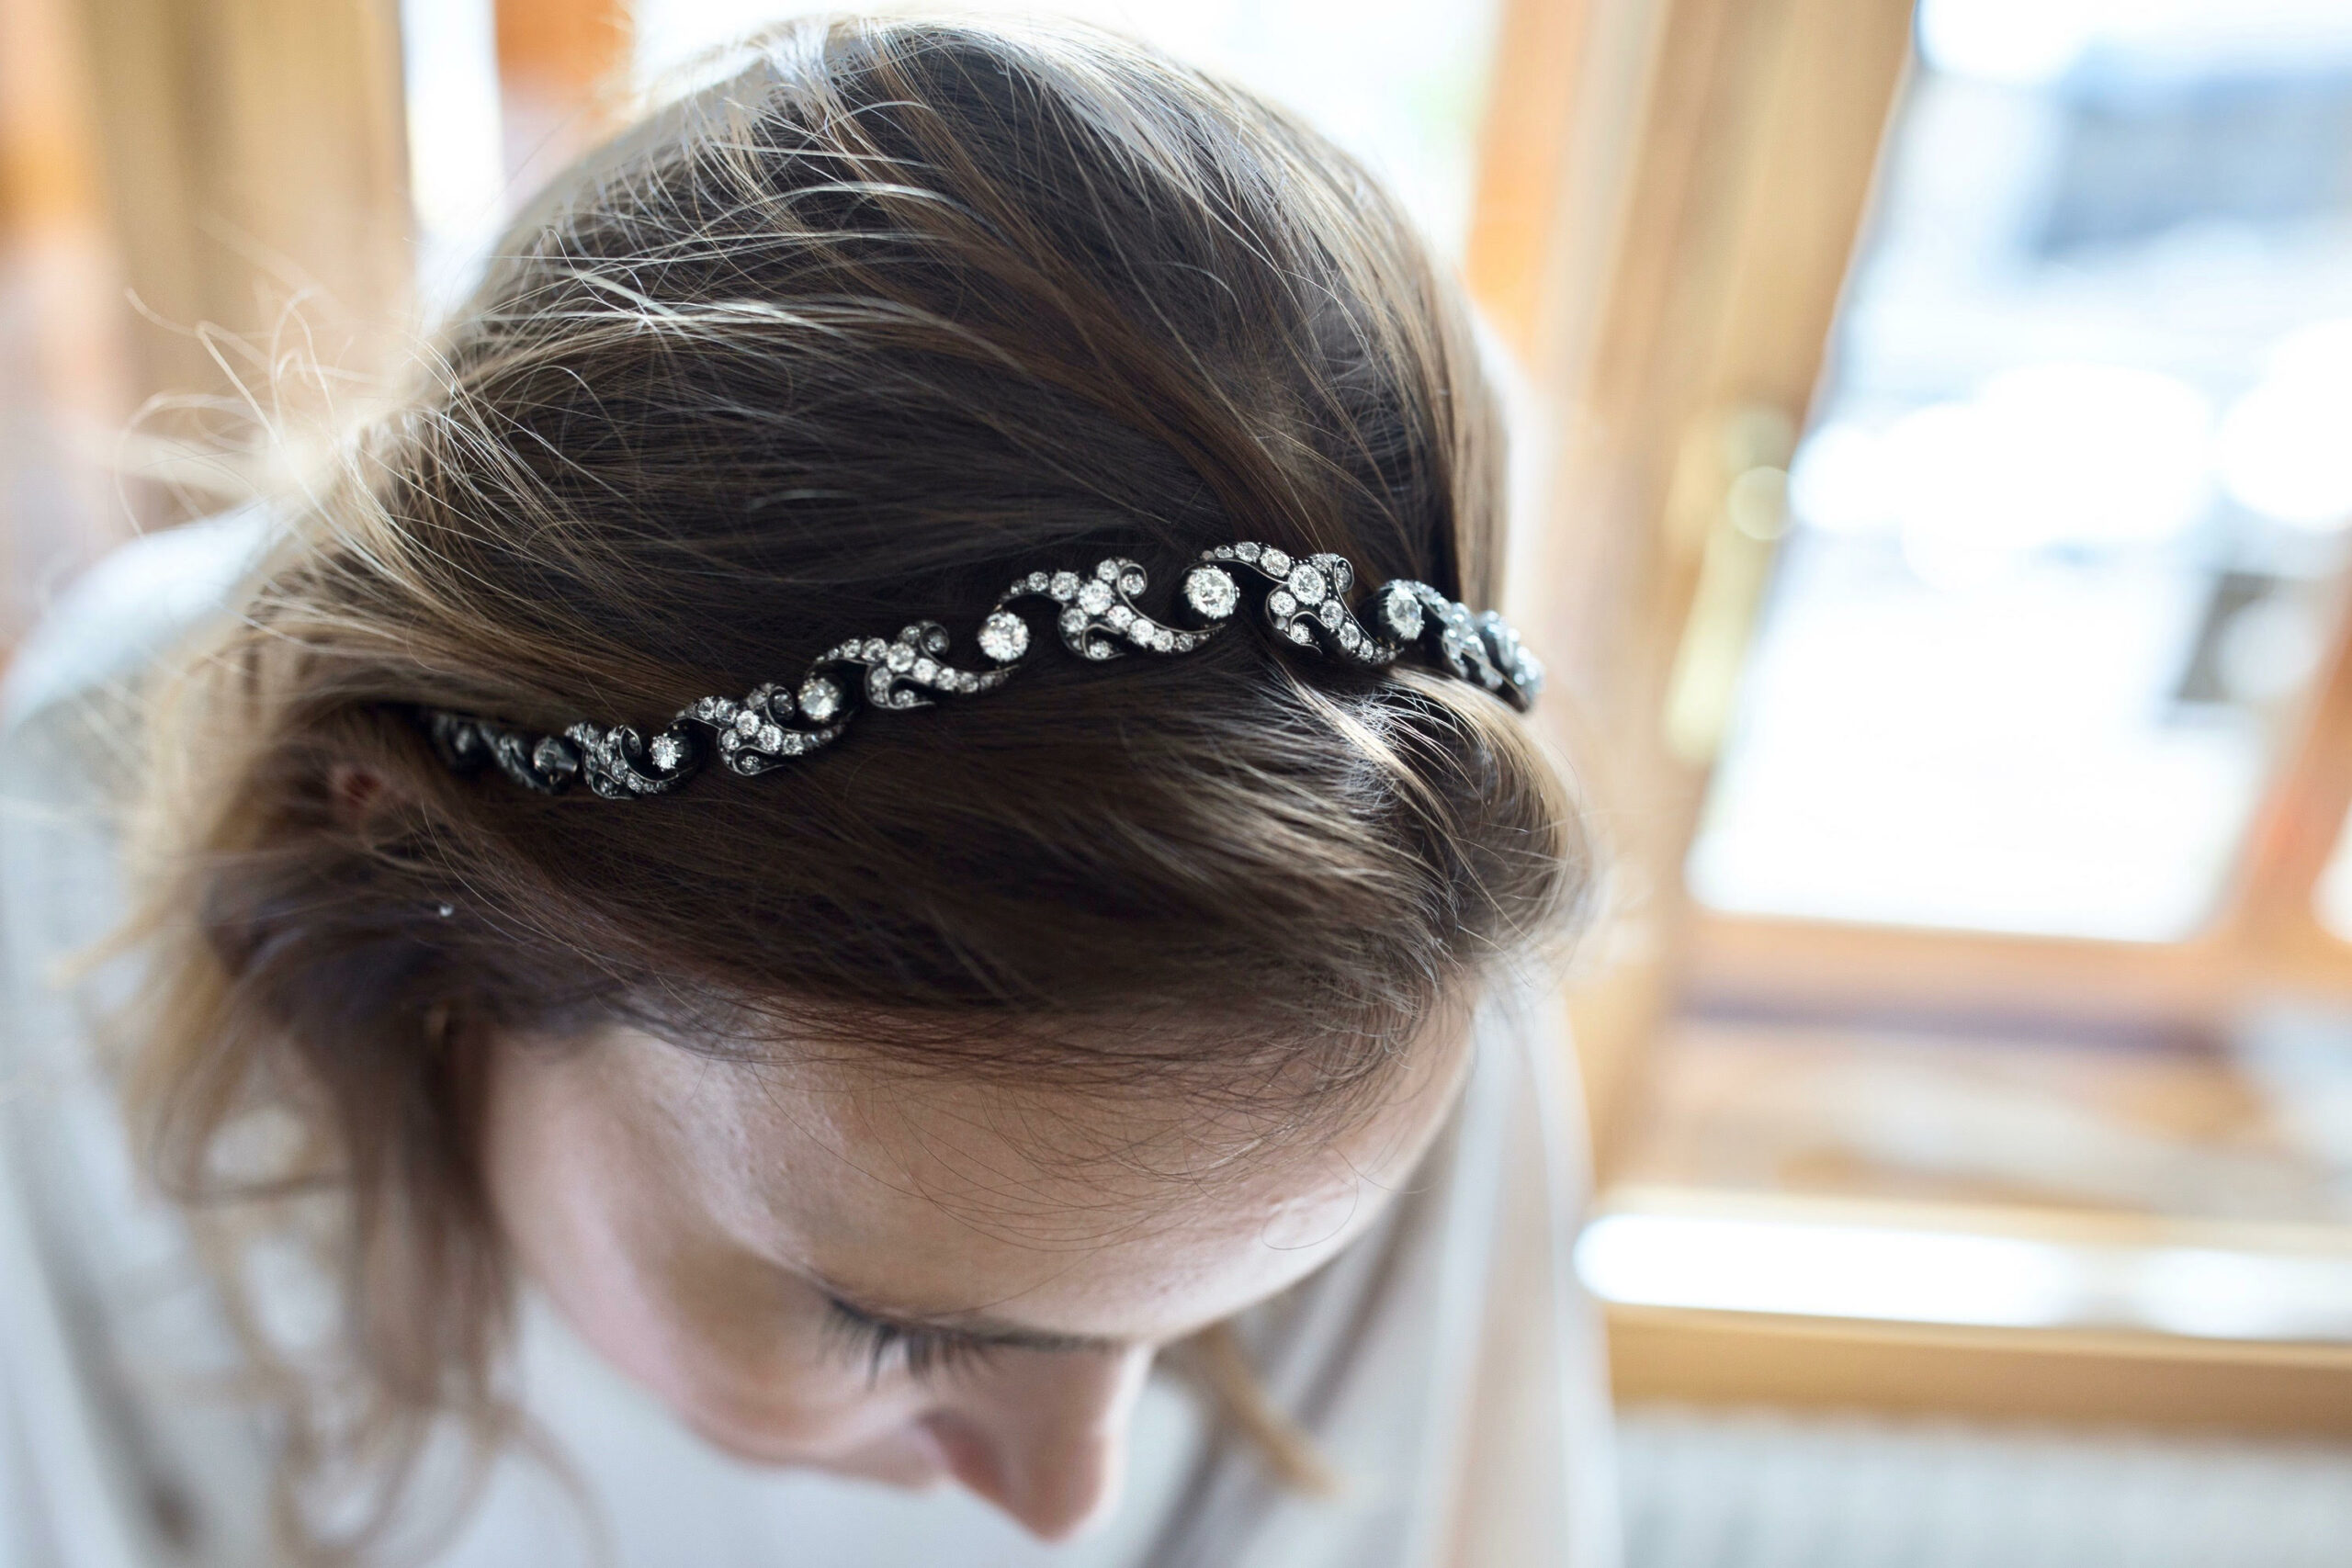 Golden pot leaf headband hair accessory with diamond cluster